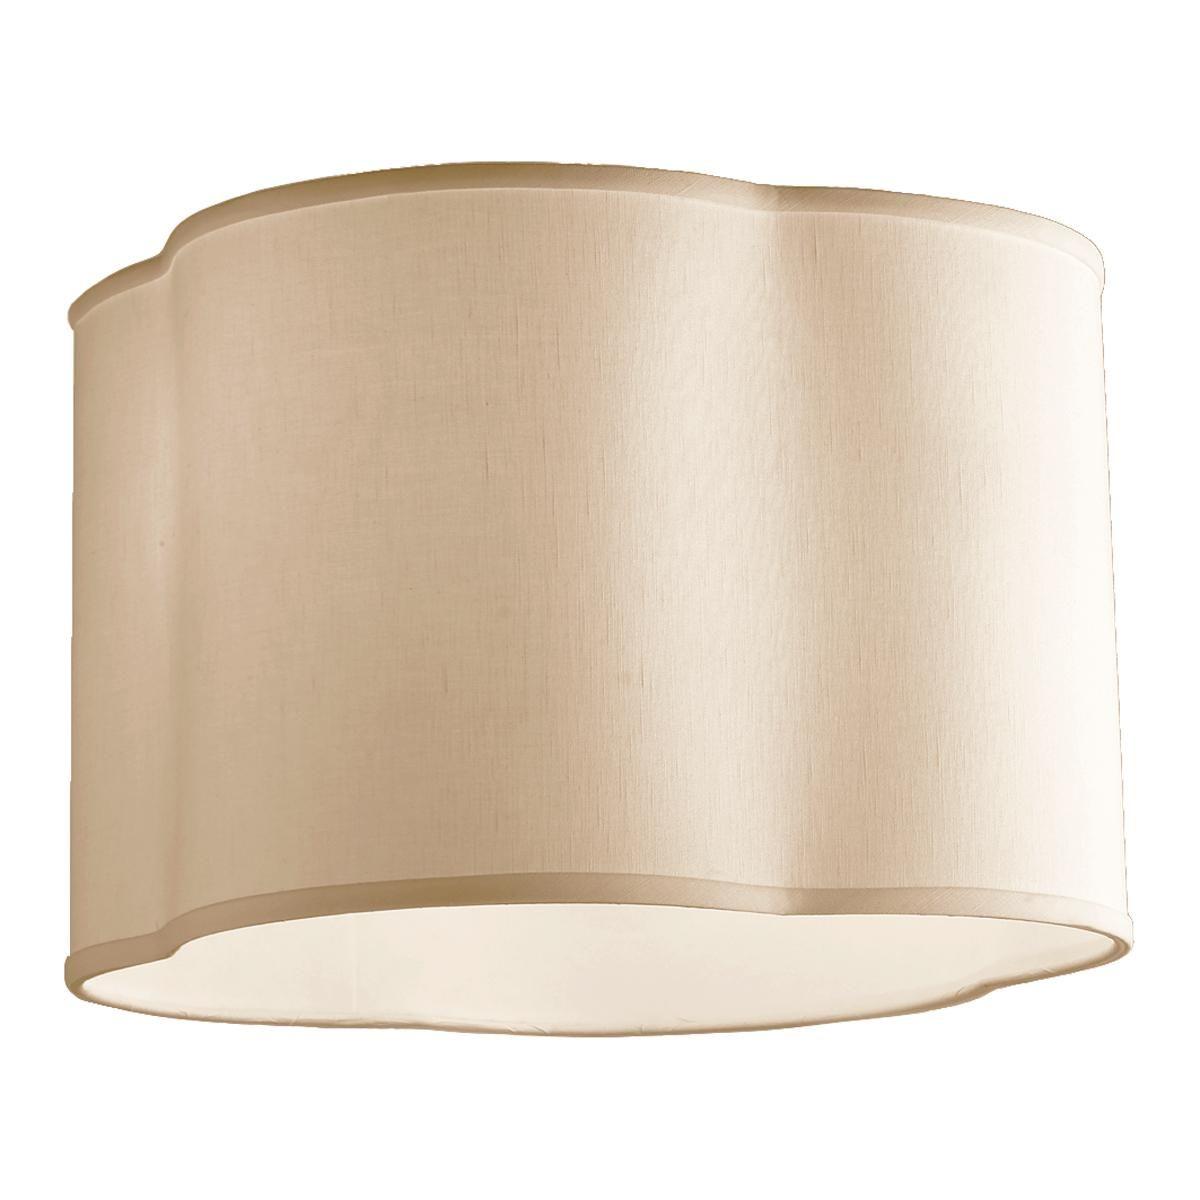 16 Quatrefoil Shade Replacement Lamp Shades Quatrefoil Fabric Fabric Chandelier